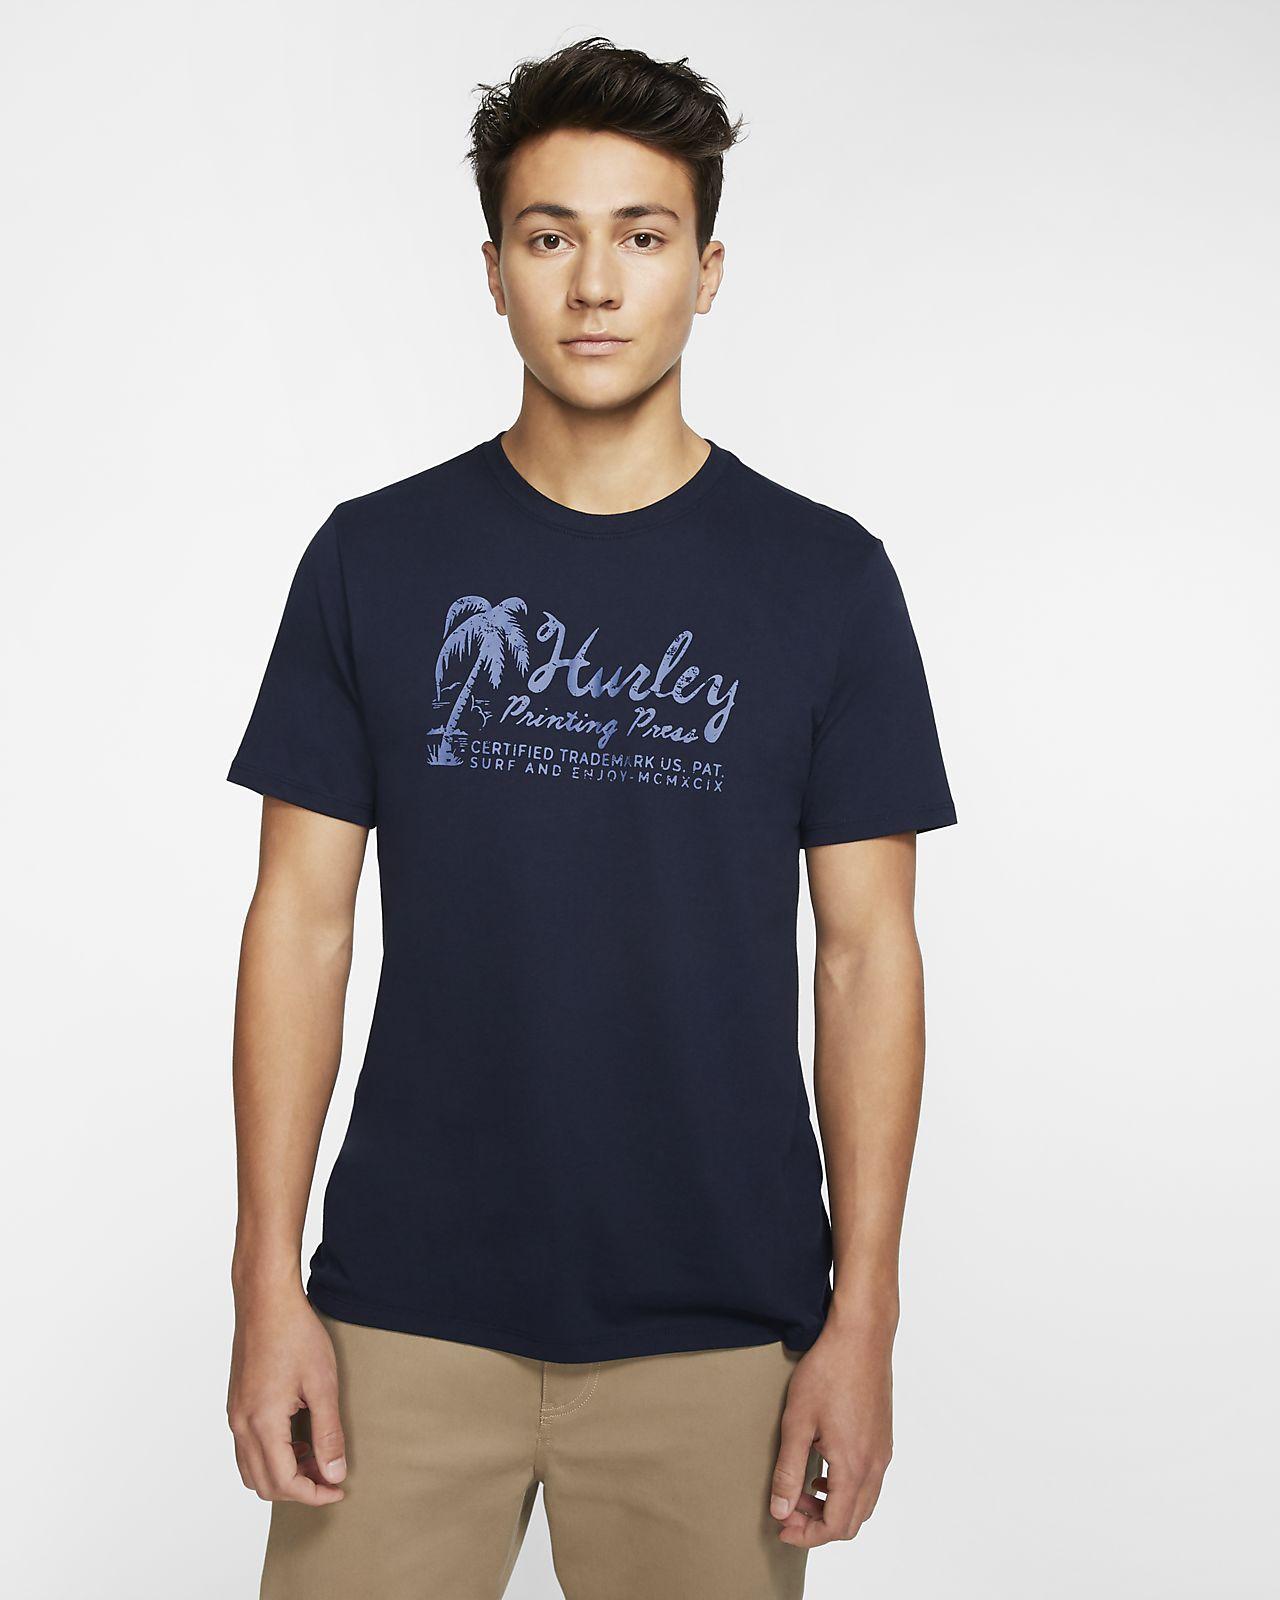 Tee-shirt coupe Premium Hurley Dri-FIT Surf Imports pour Homme